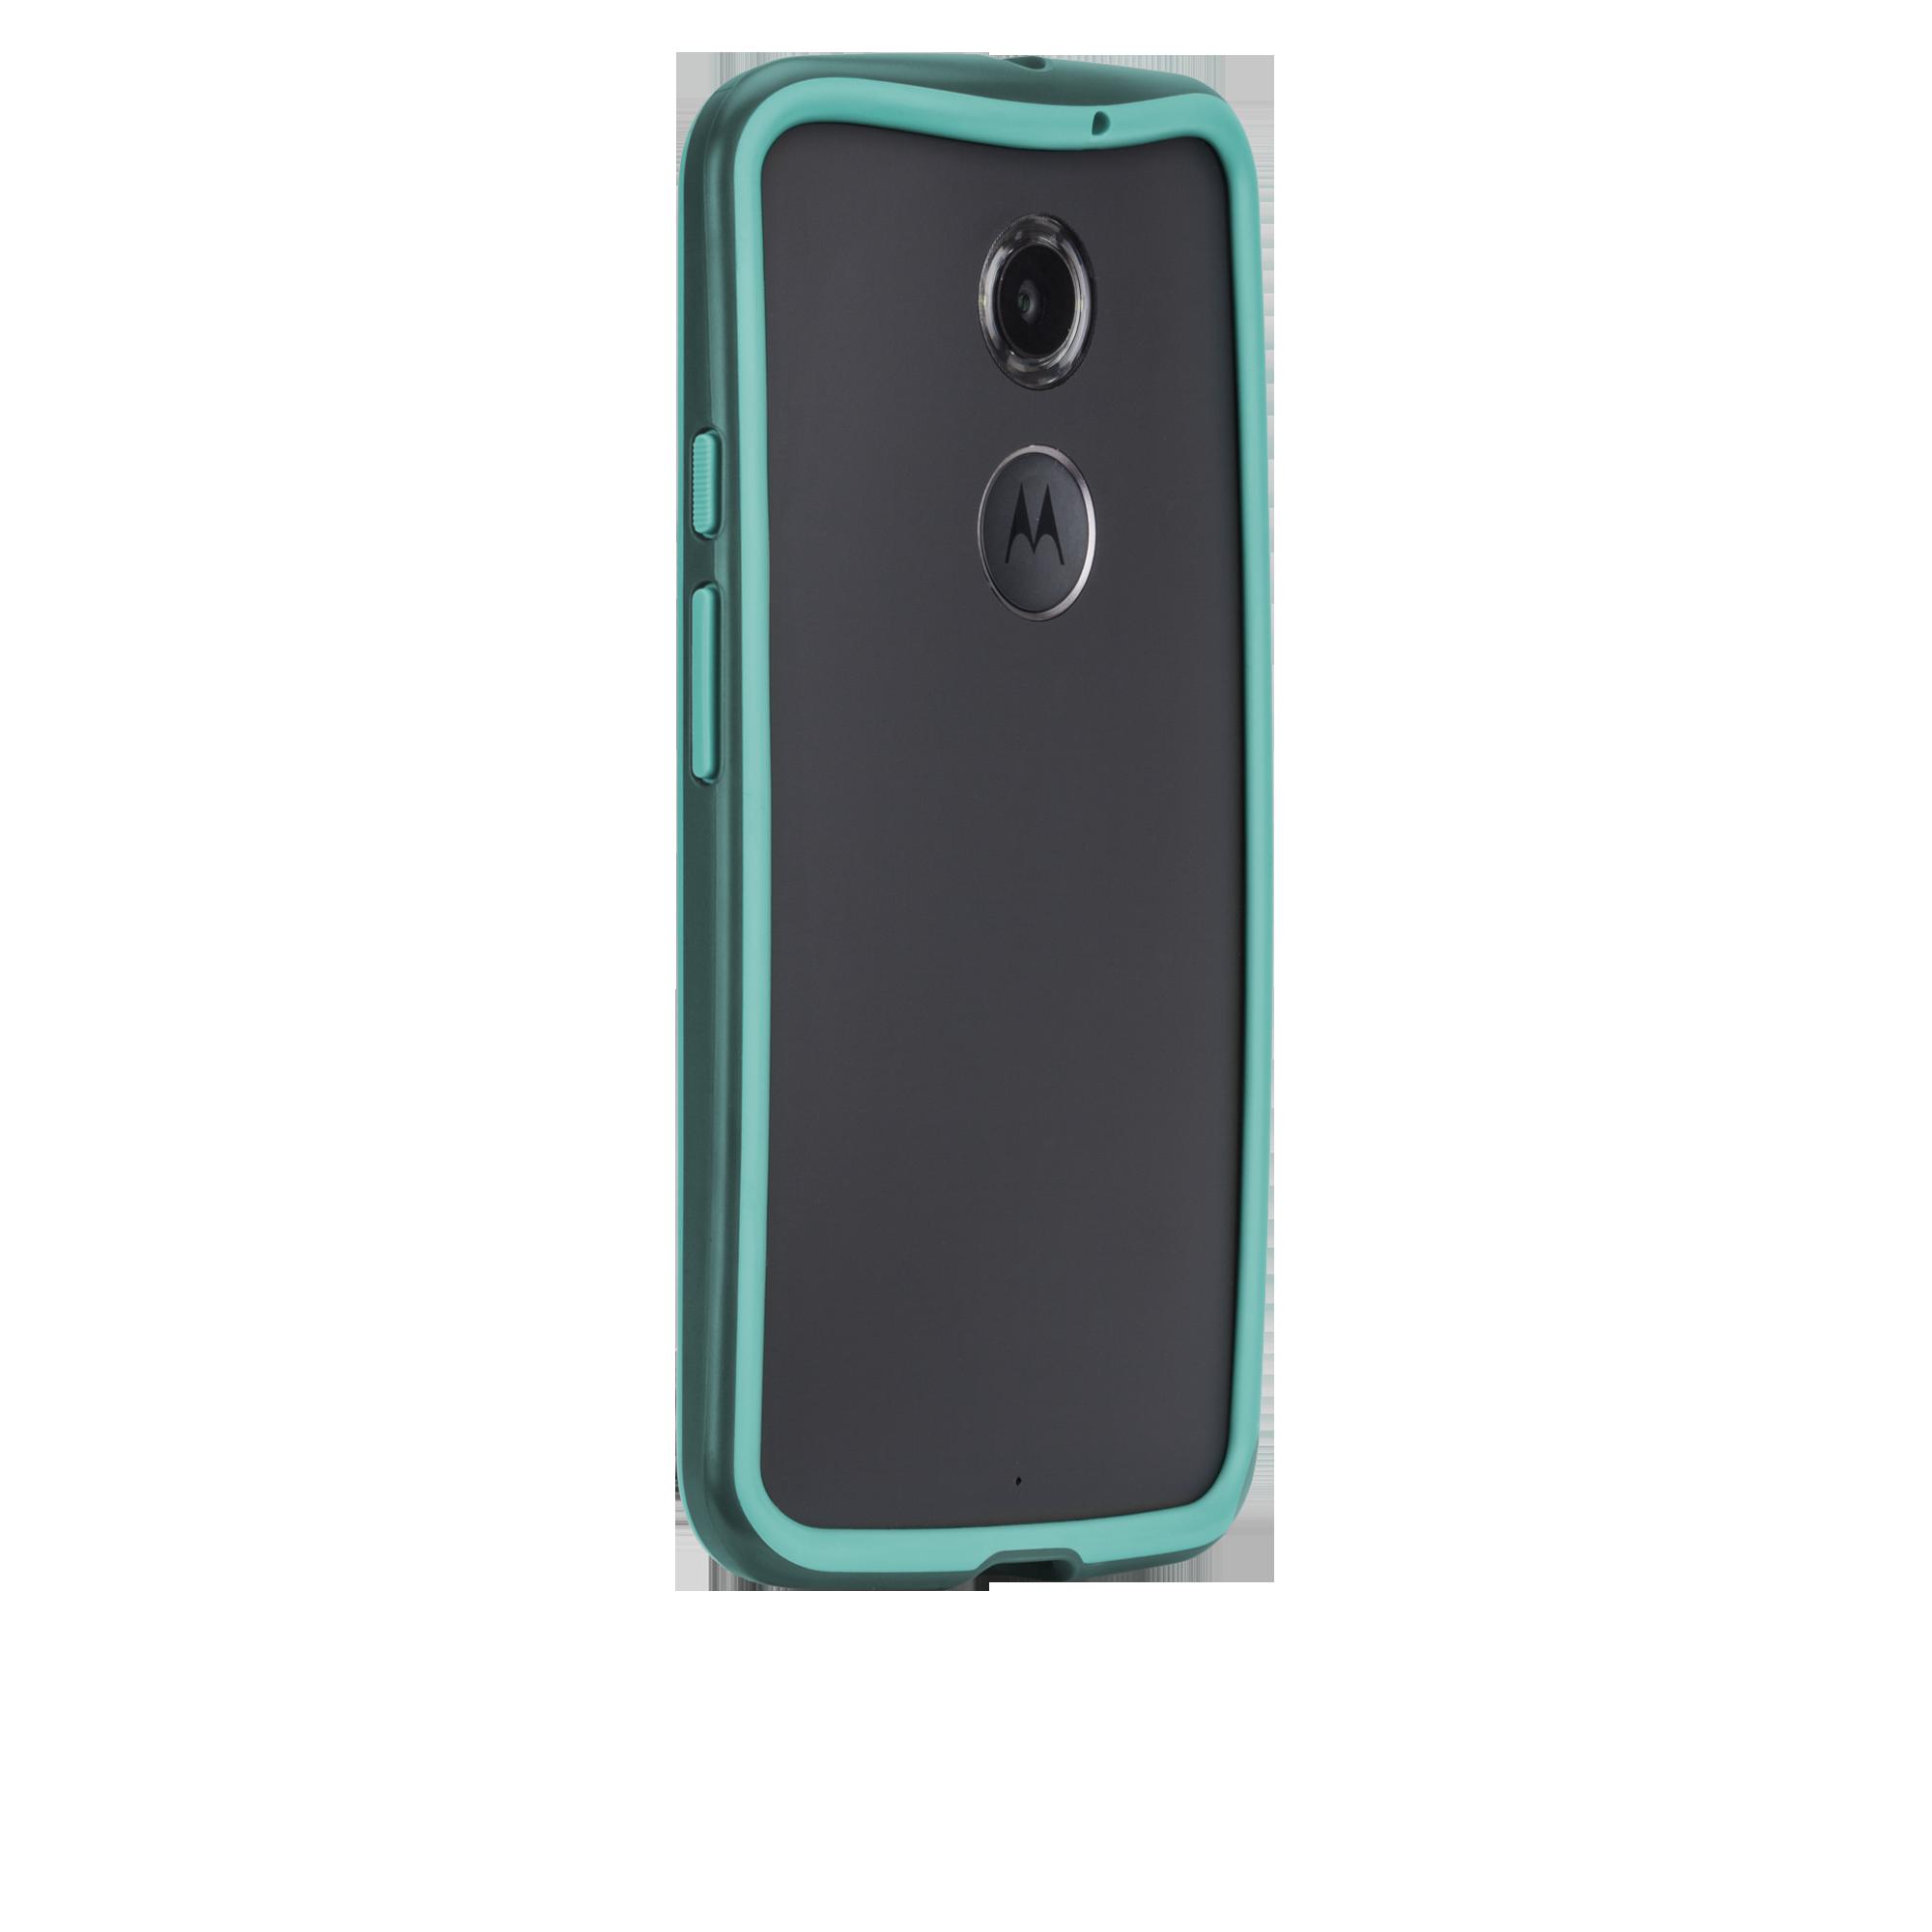 Tough Frame Case - Dark Teal & Turquoise